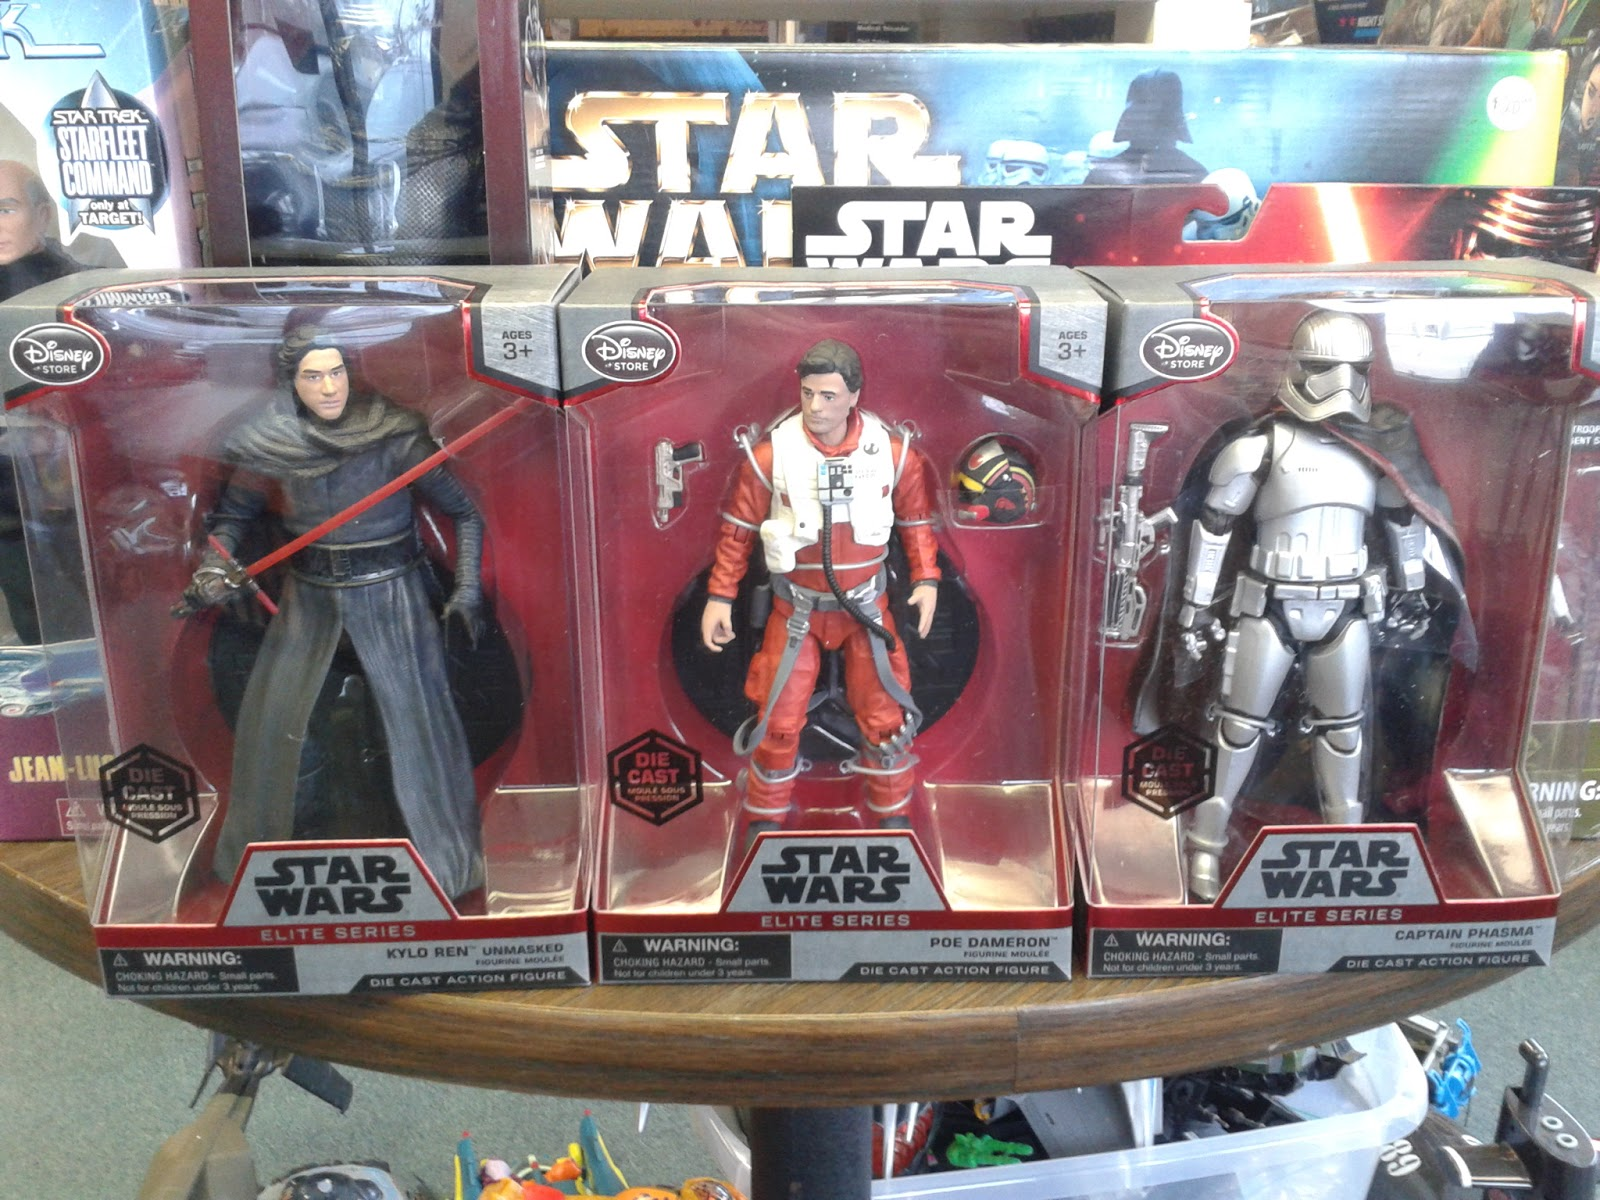 Catapult Collectibles: Star Wars Elite Series Die-Cast Action Figures